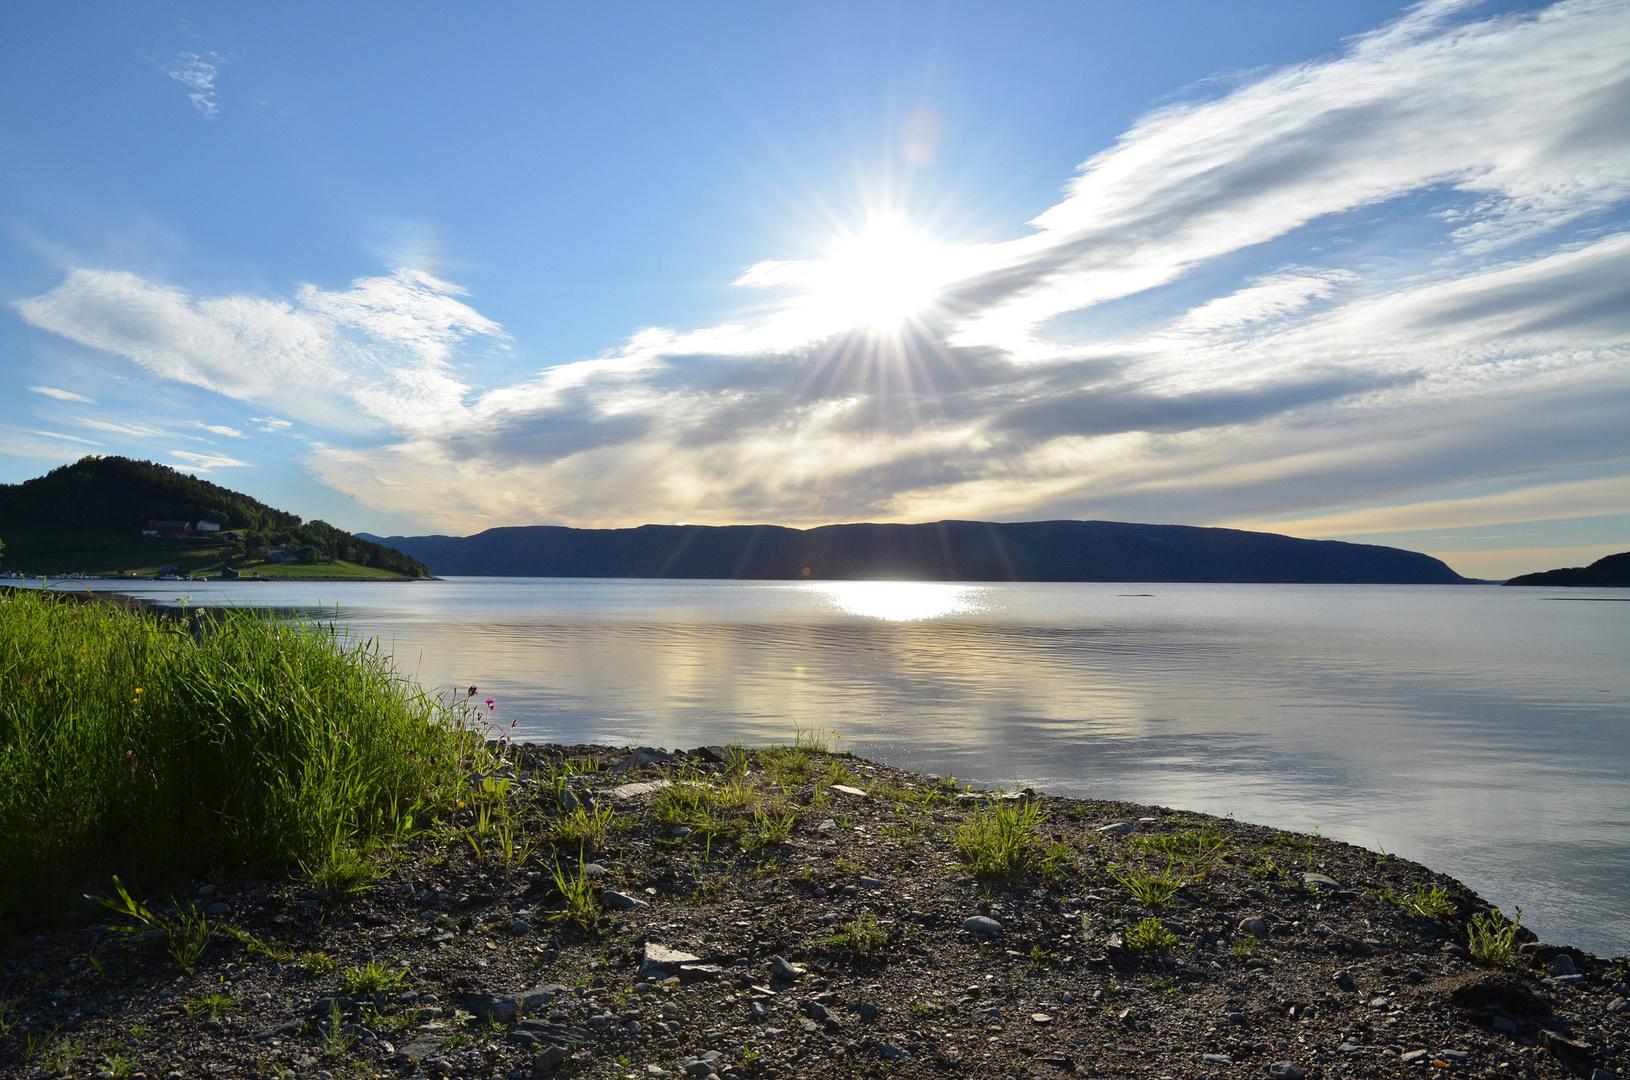 Fjord in Norway – 2013